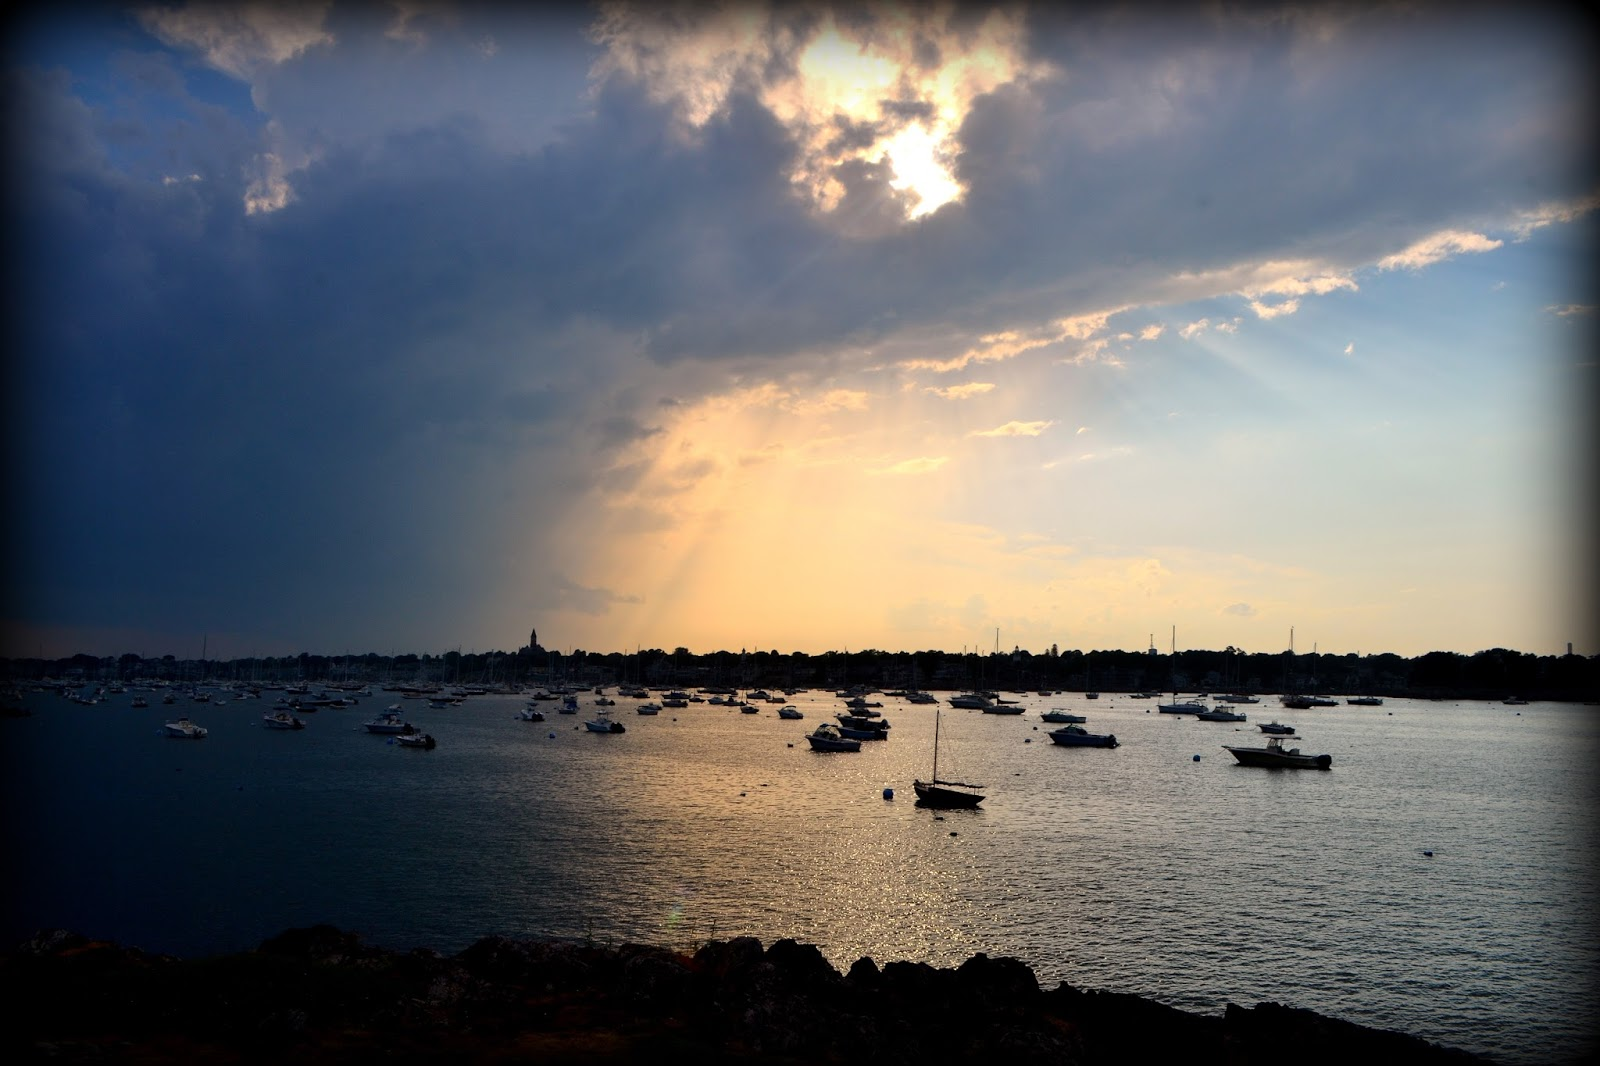 dark, harbor, contrast, boats, marblehead, silhouette